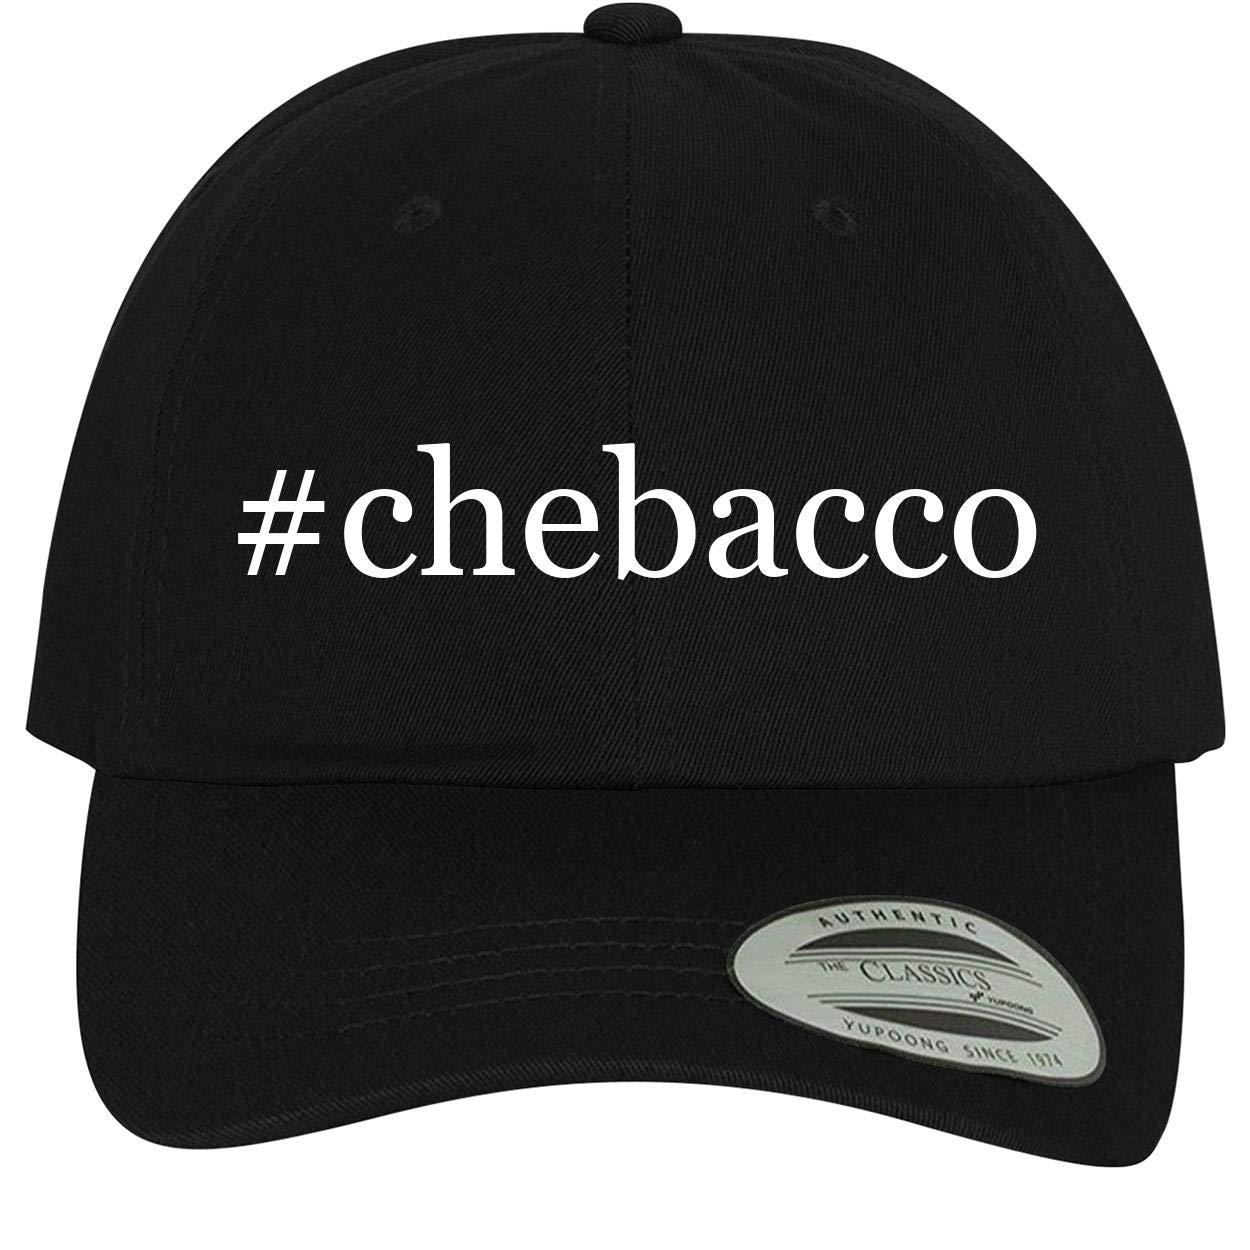 Comfortable Dad Hat Baseball Cap BH Cool Designs #Chebacco